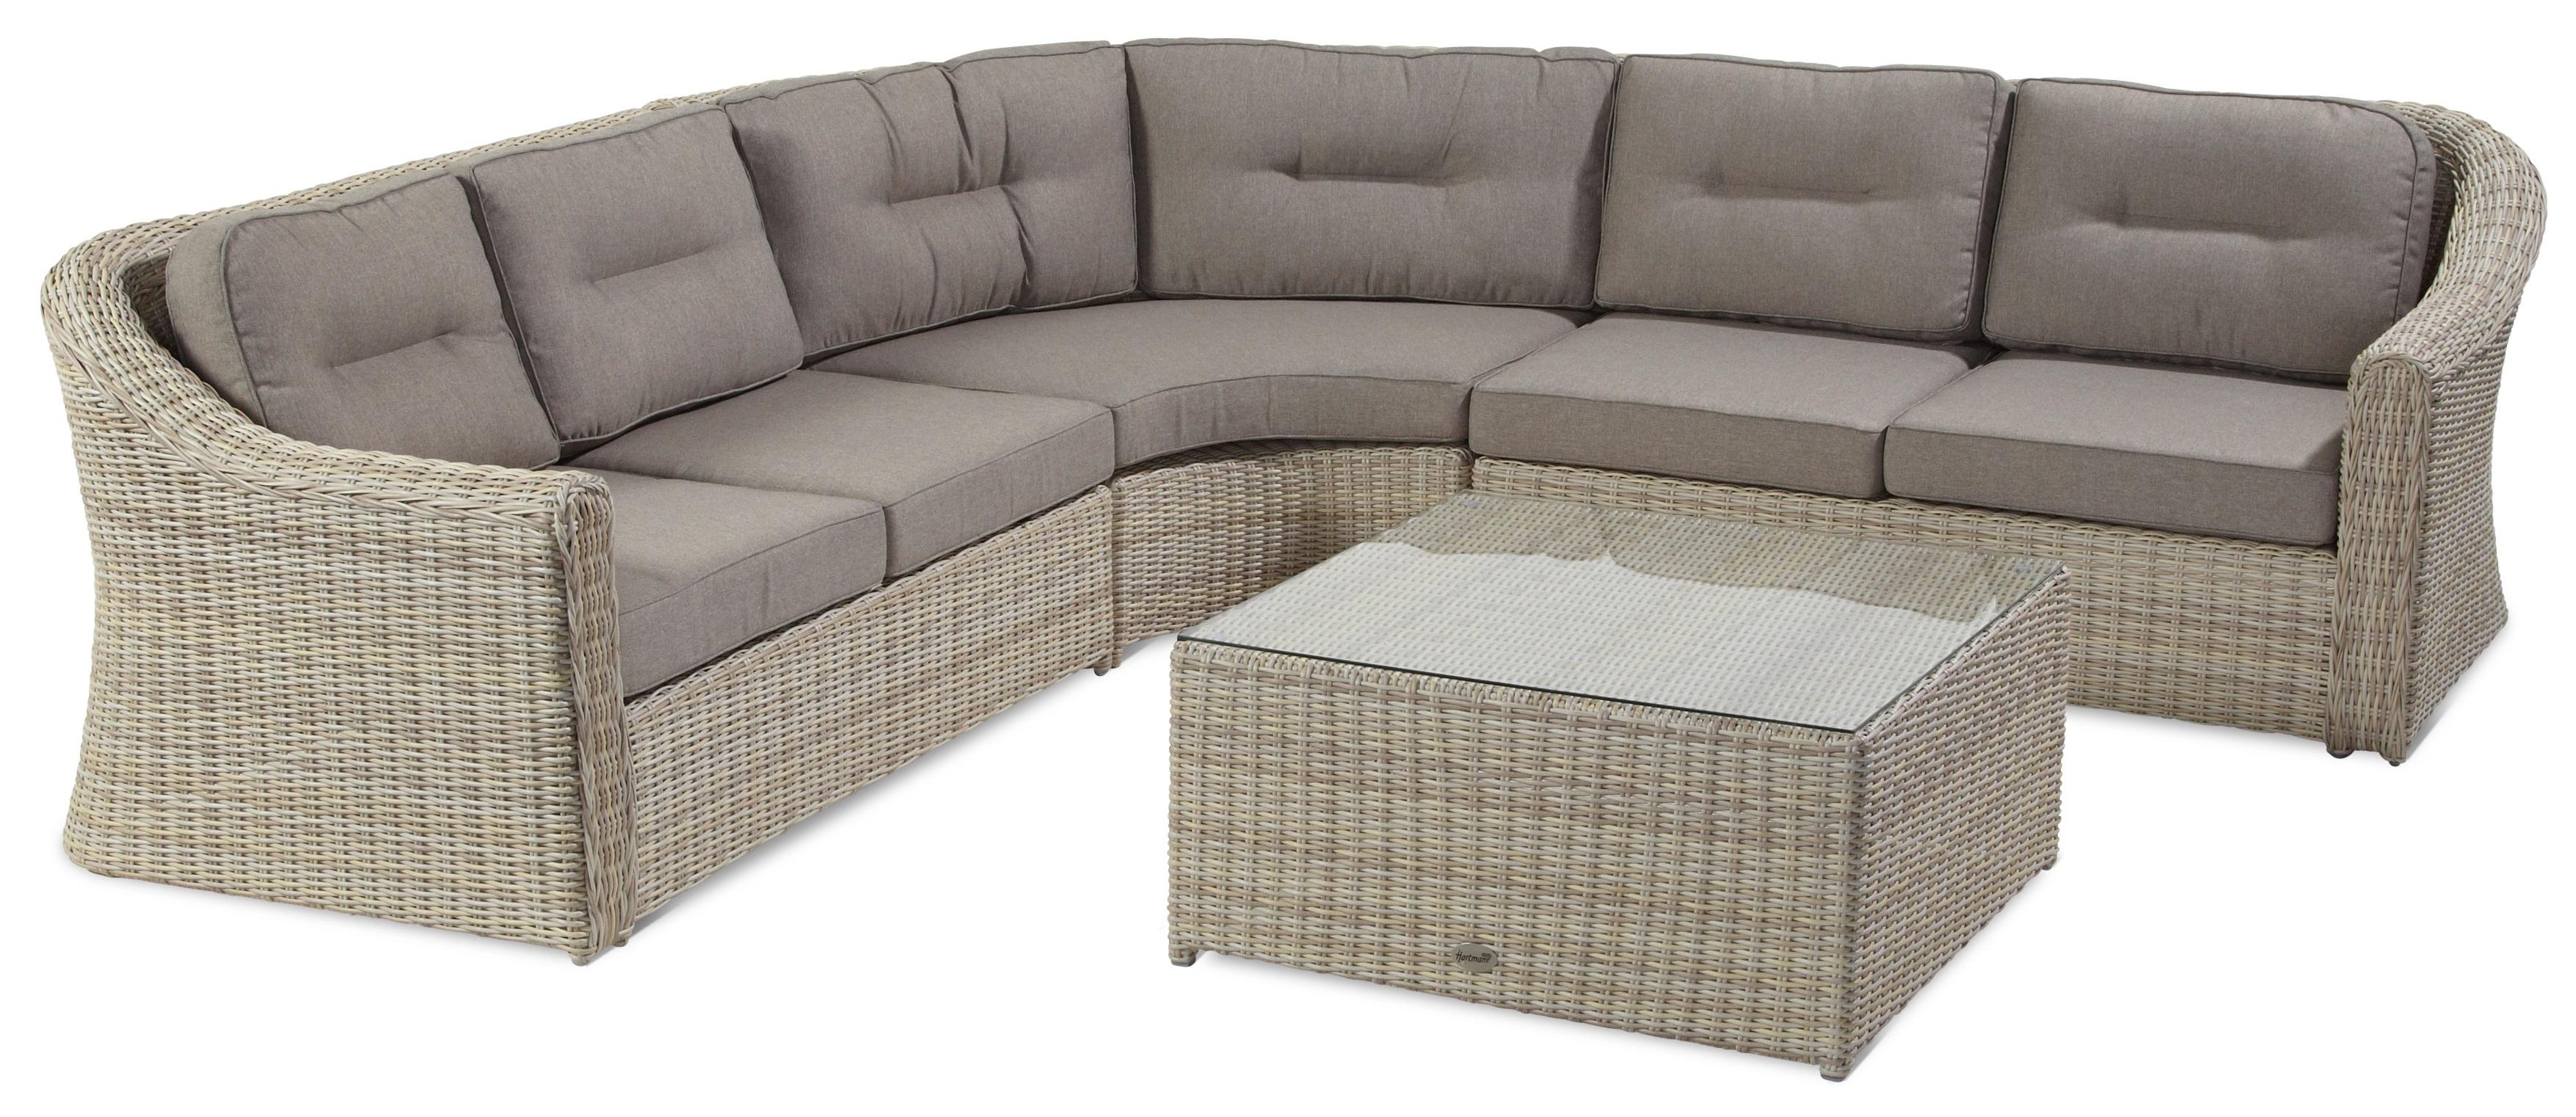 Sofa Set From Hartman